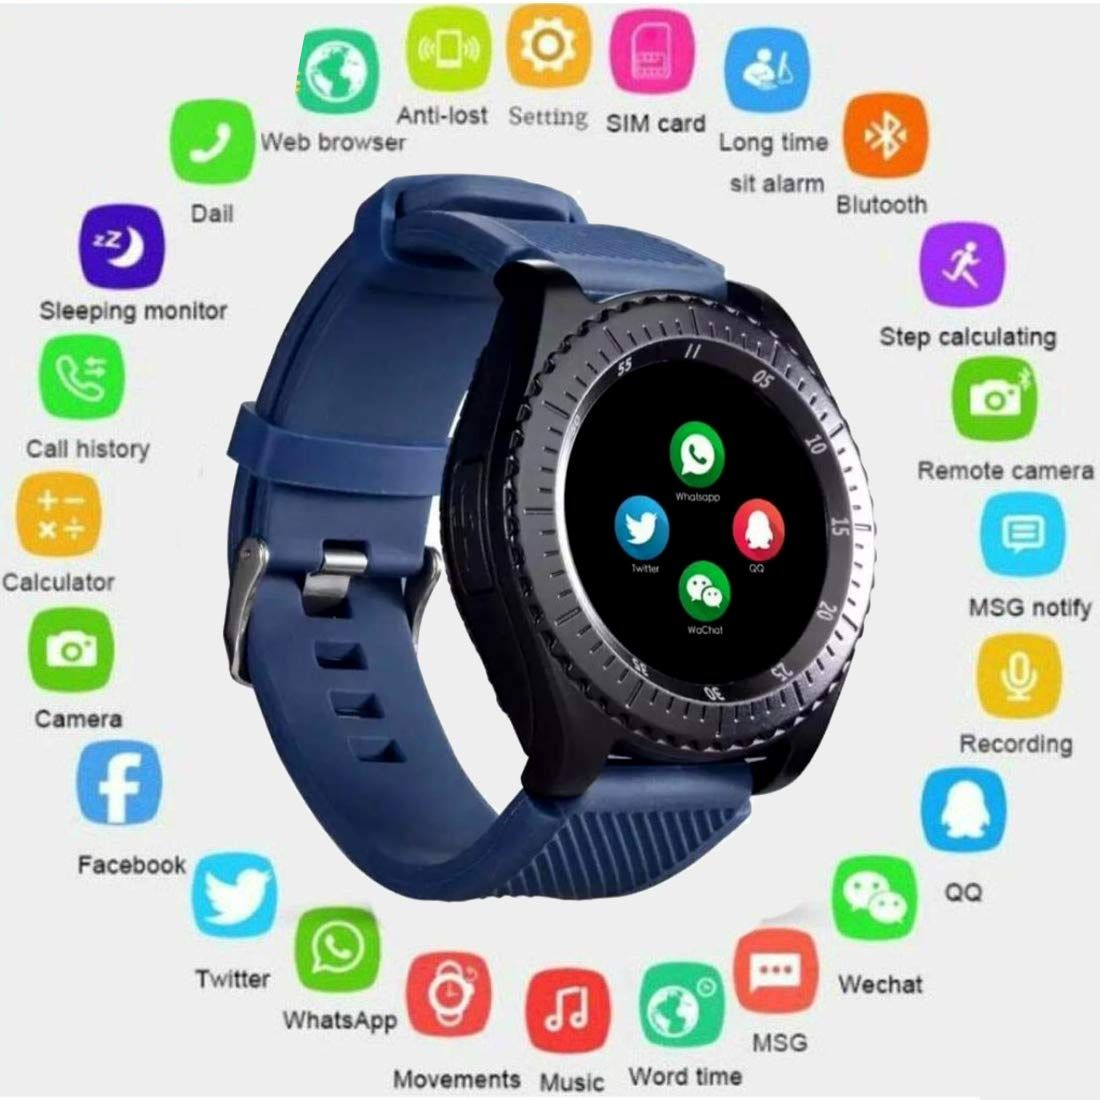 d1a0d91374d81d6246b65e78e893b3d1 Smart Watch Time Setting